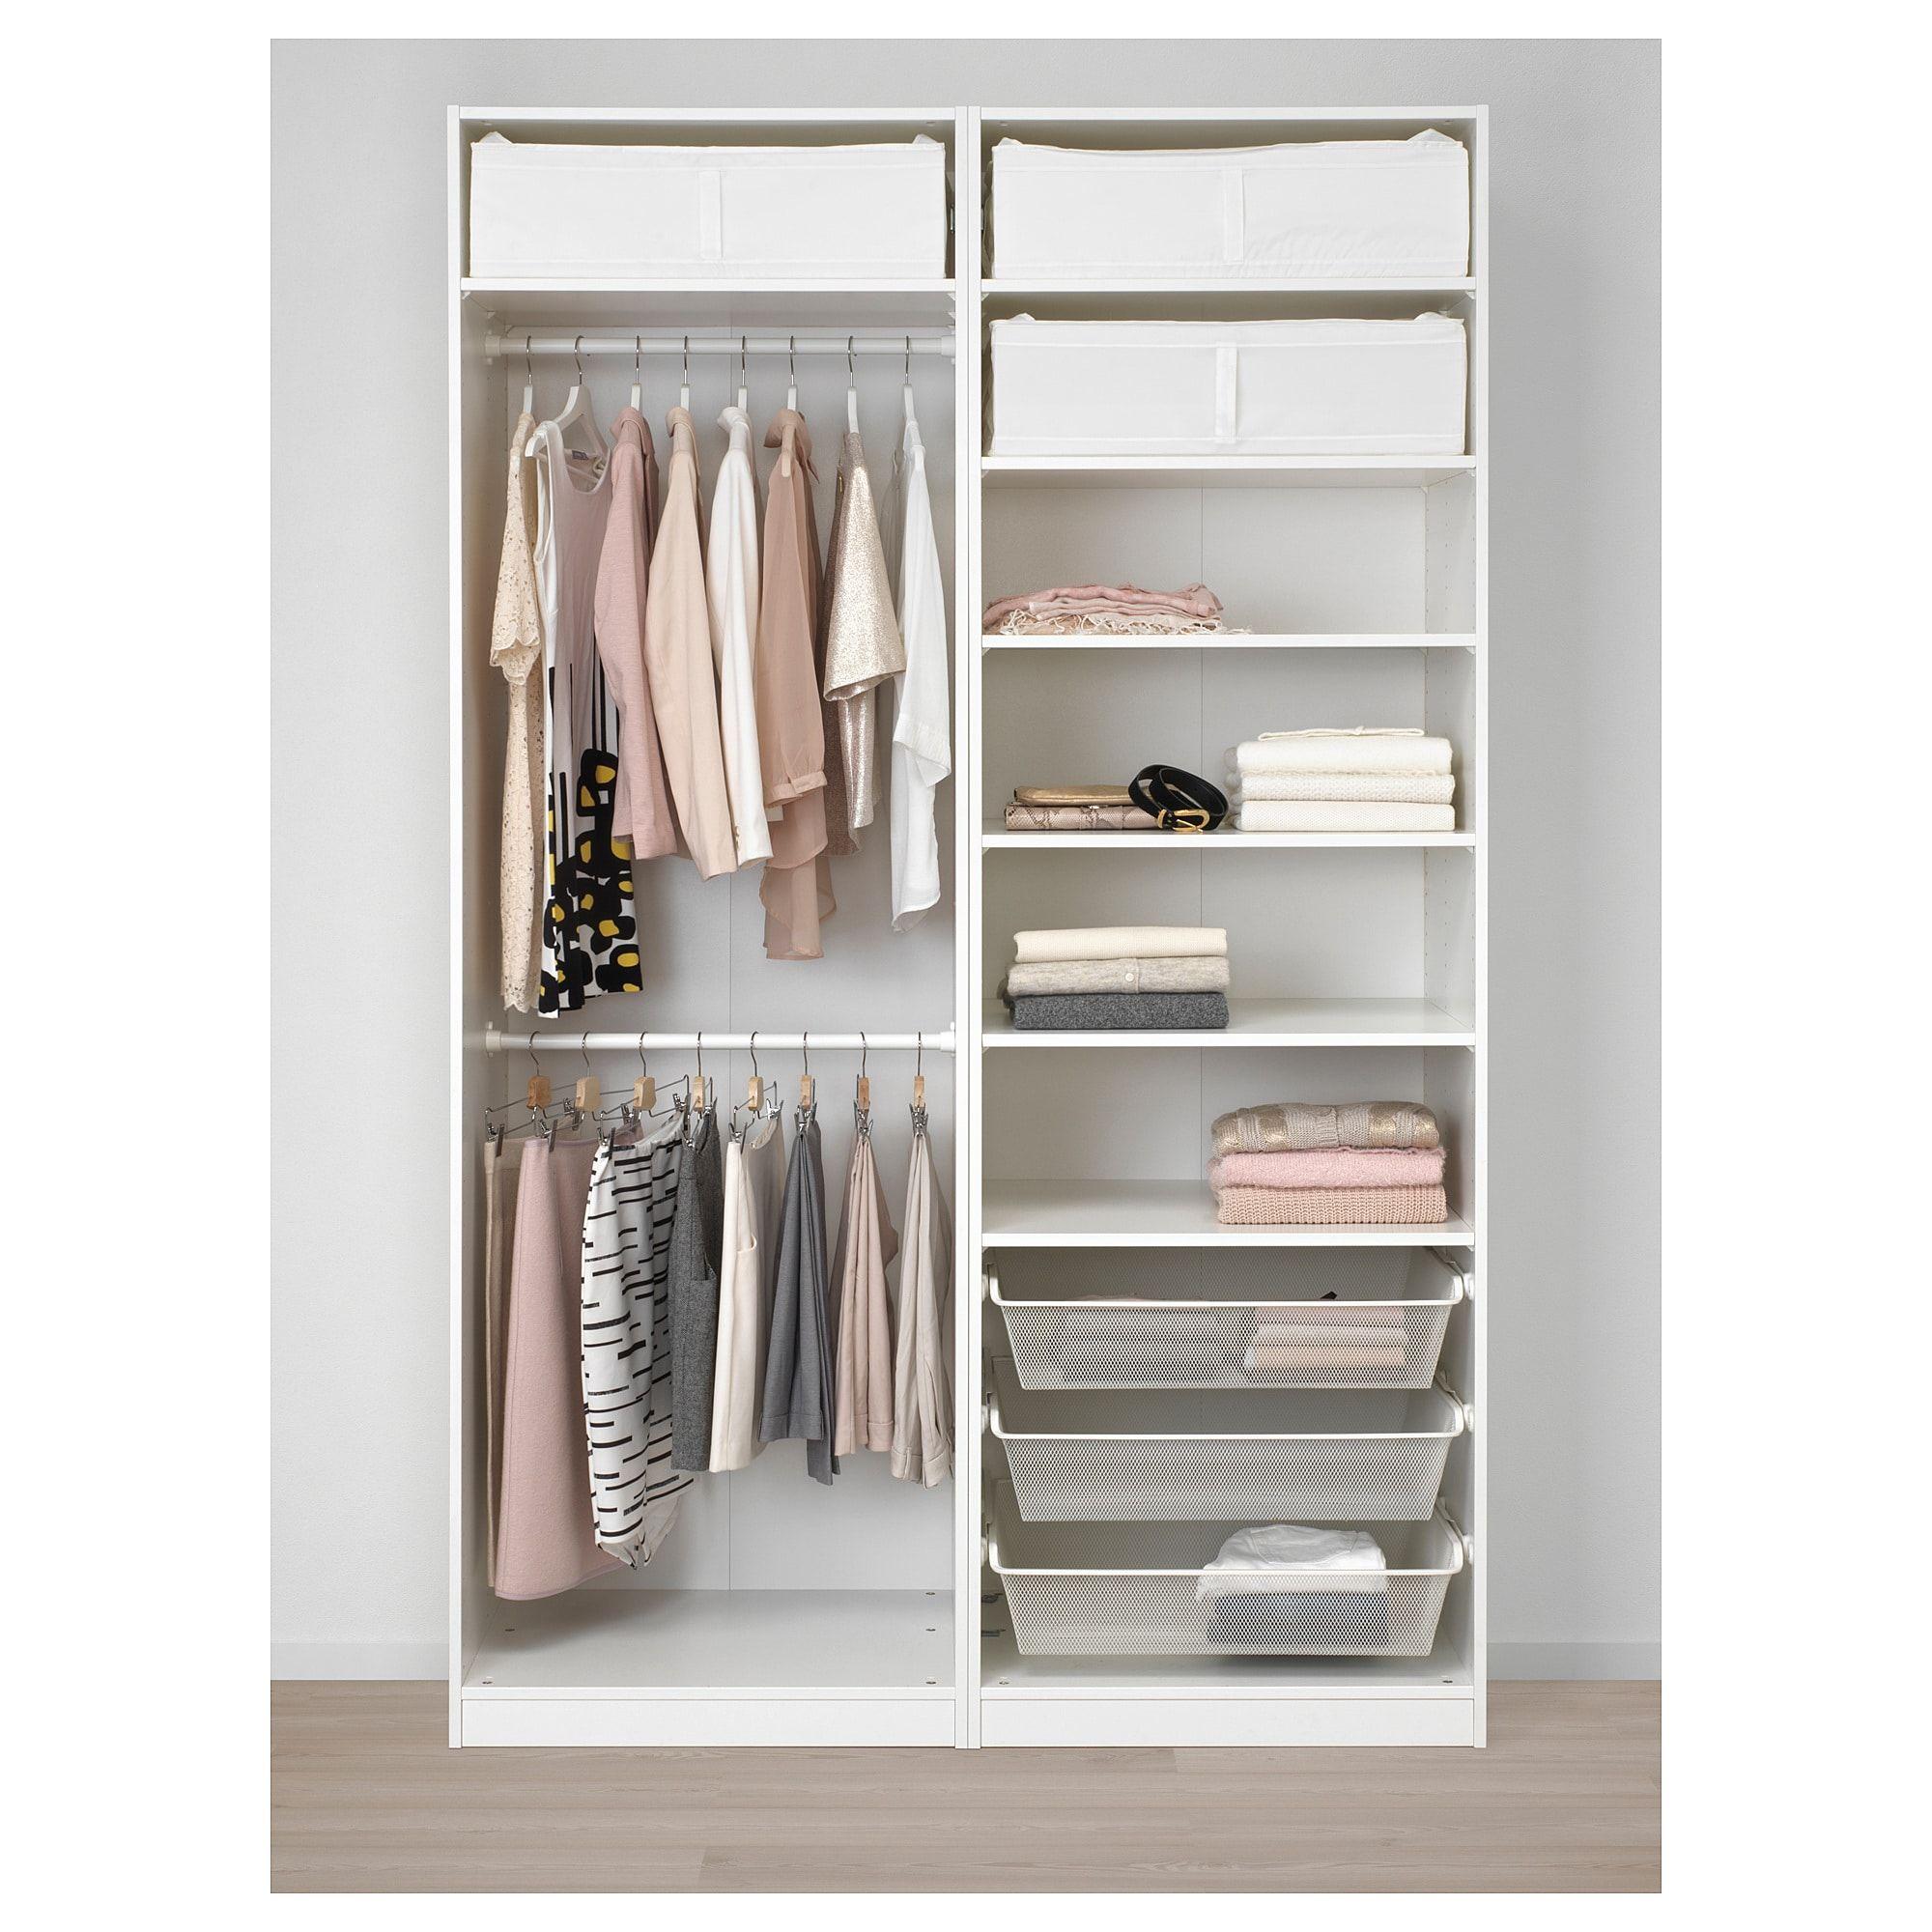 Ikea Us Furniture And Home Furnishings Ikea Pax Wardrobe Ikea Closet Organizer Closet Layout